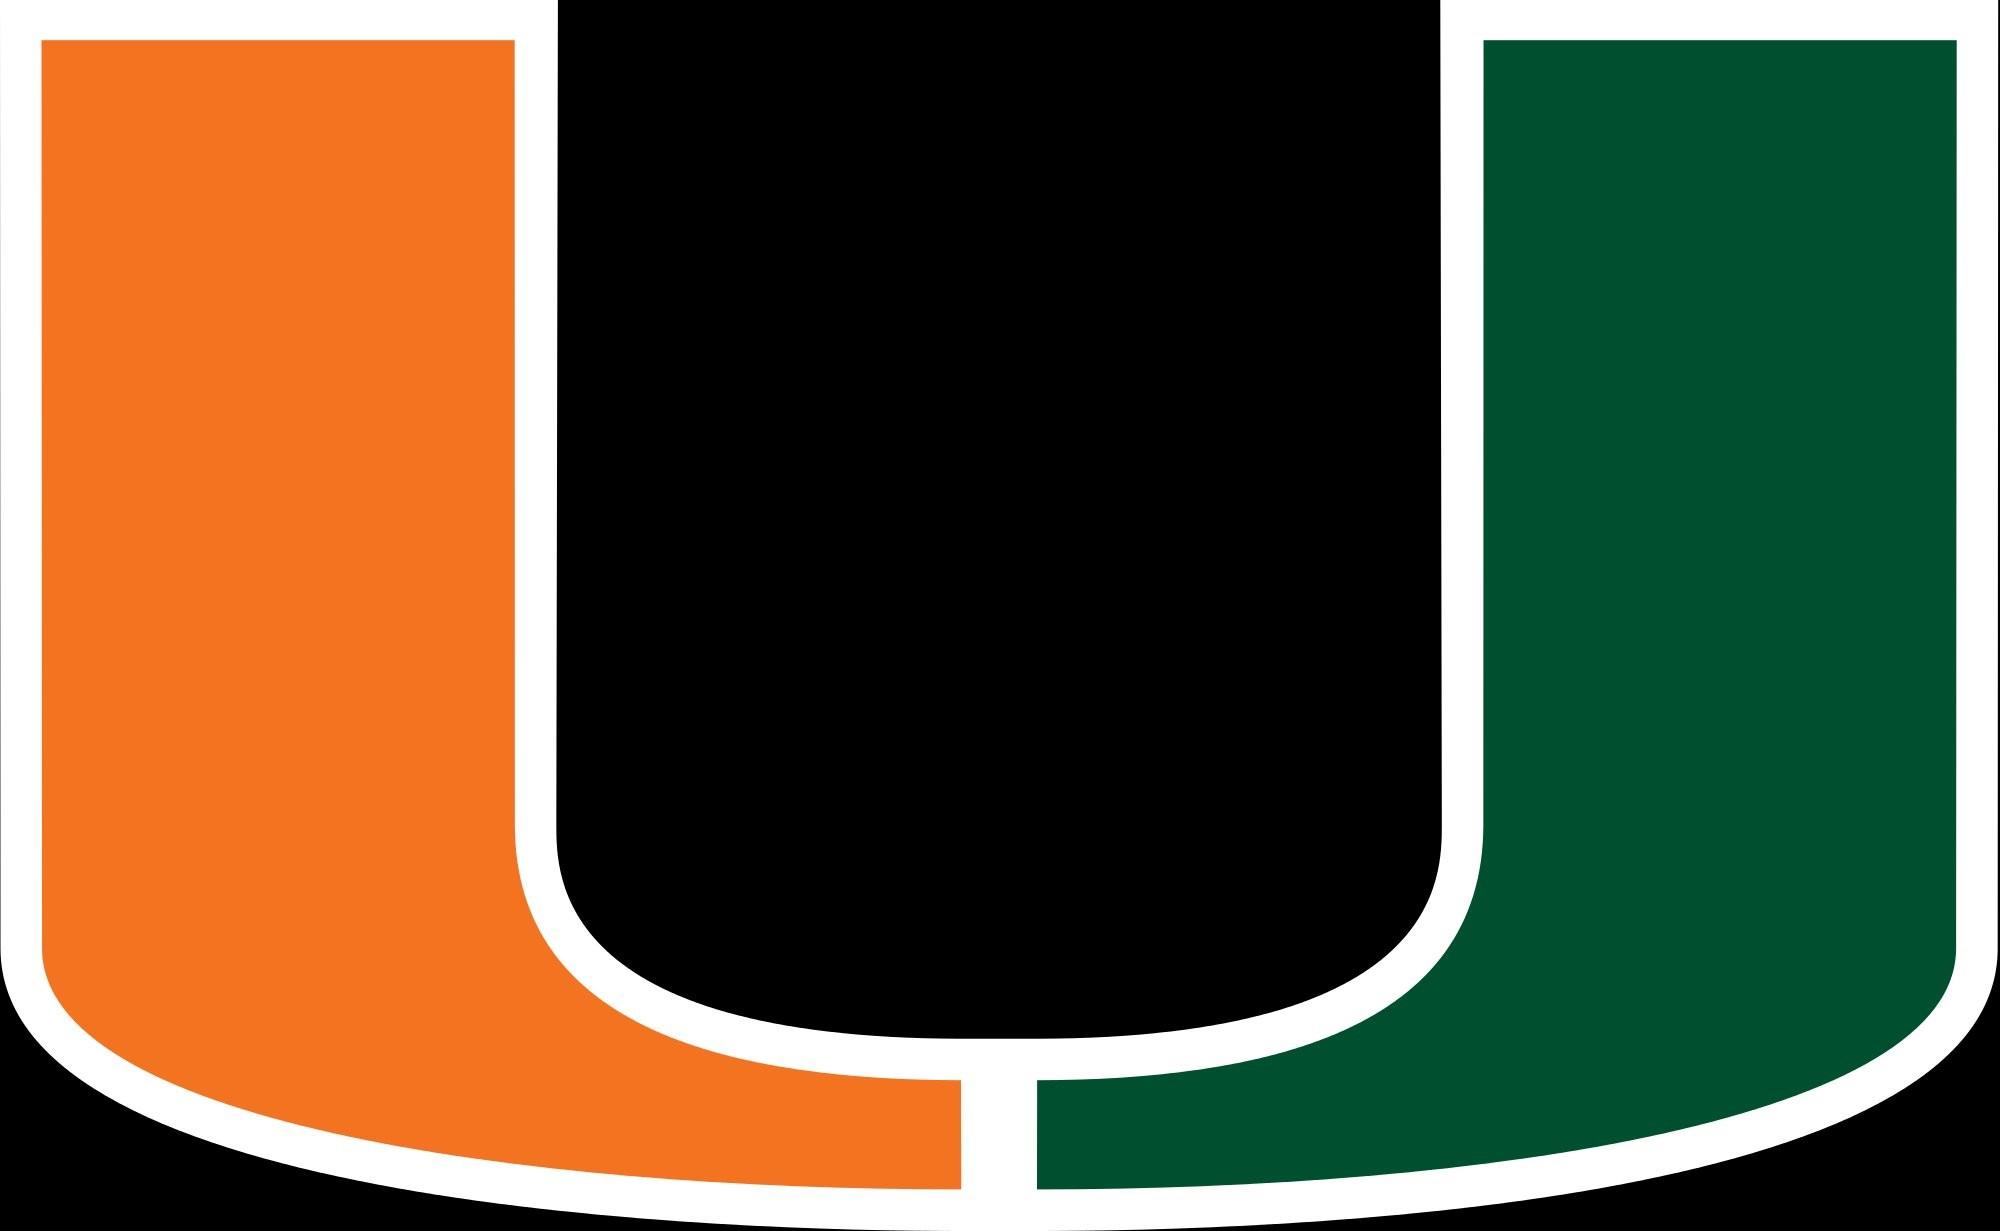 Oklahoma Sooners Wallpaper For Iphone University Of Miami Wallpaper 183 ① Wallpapertag